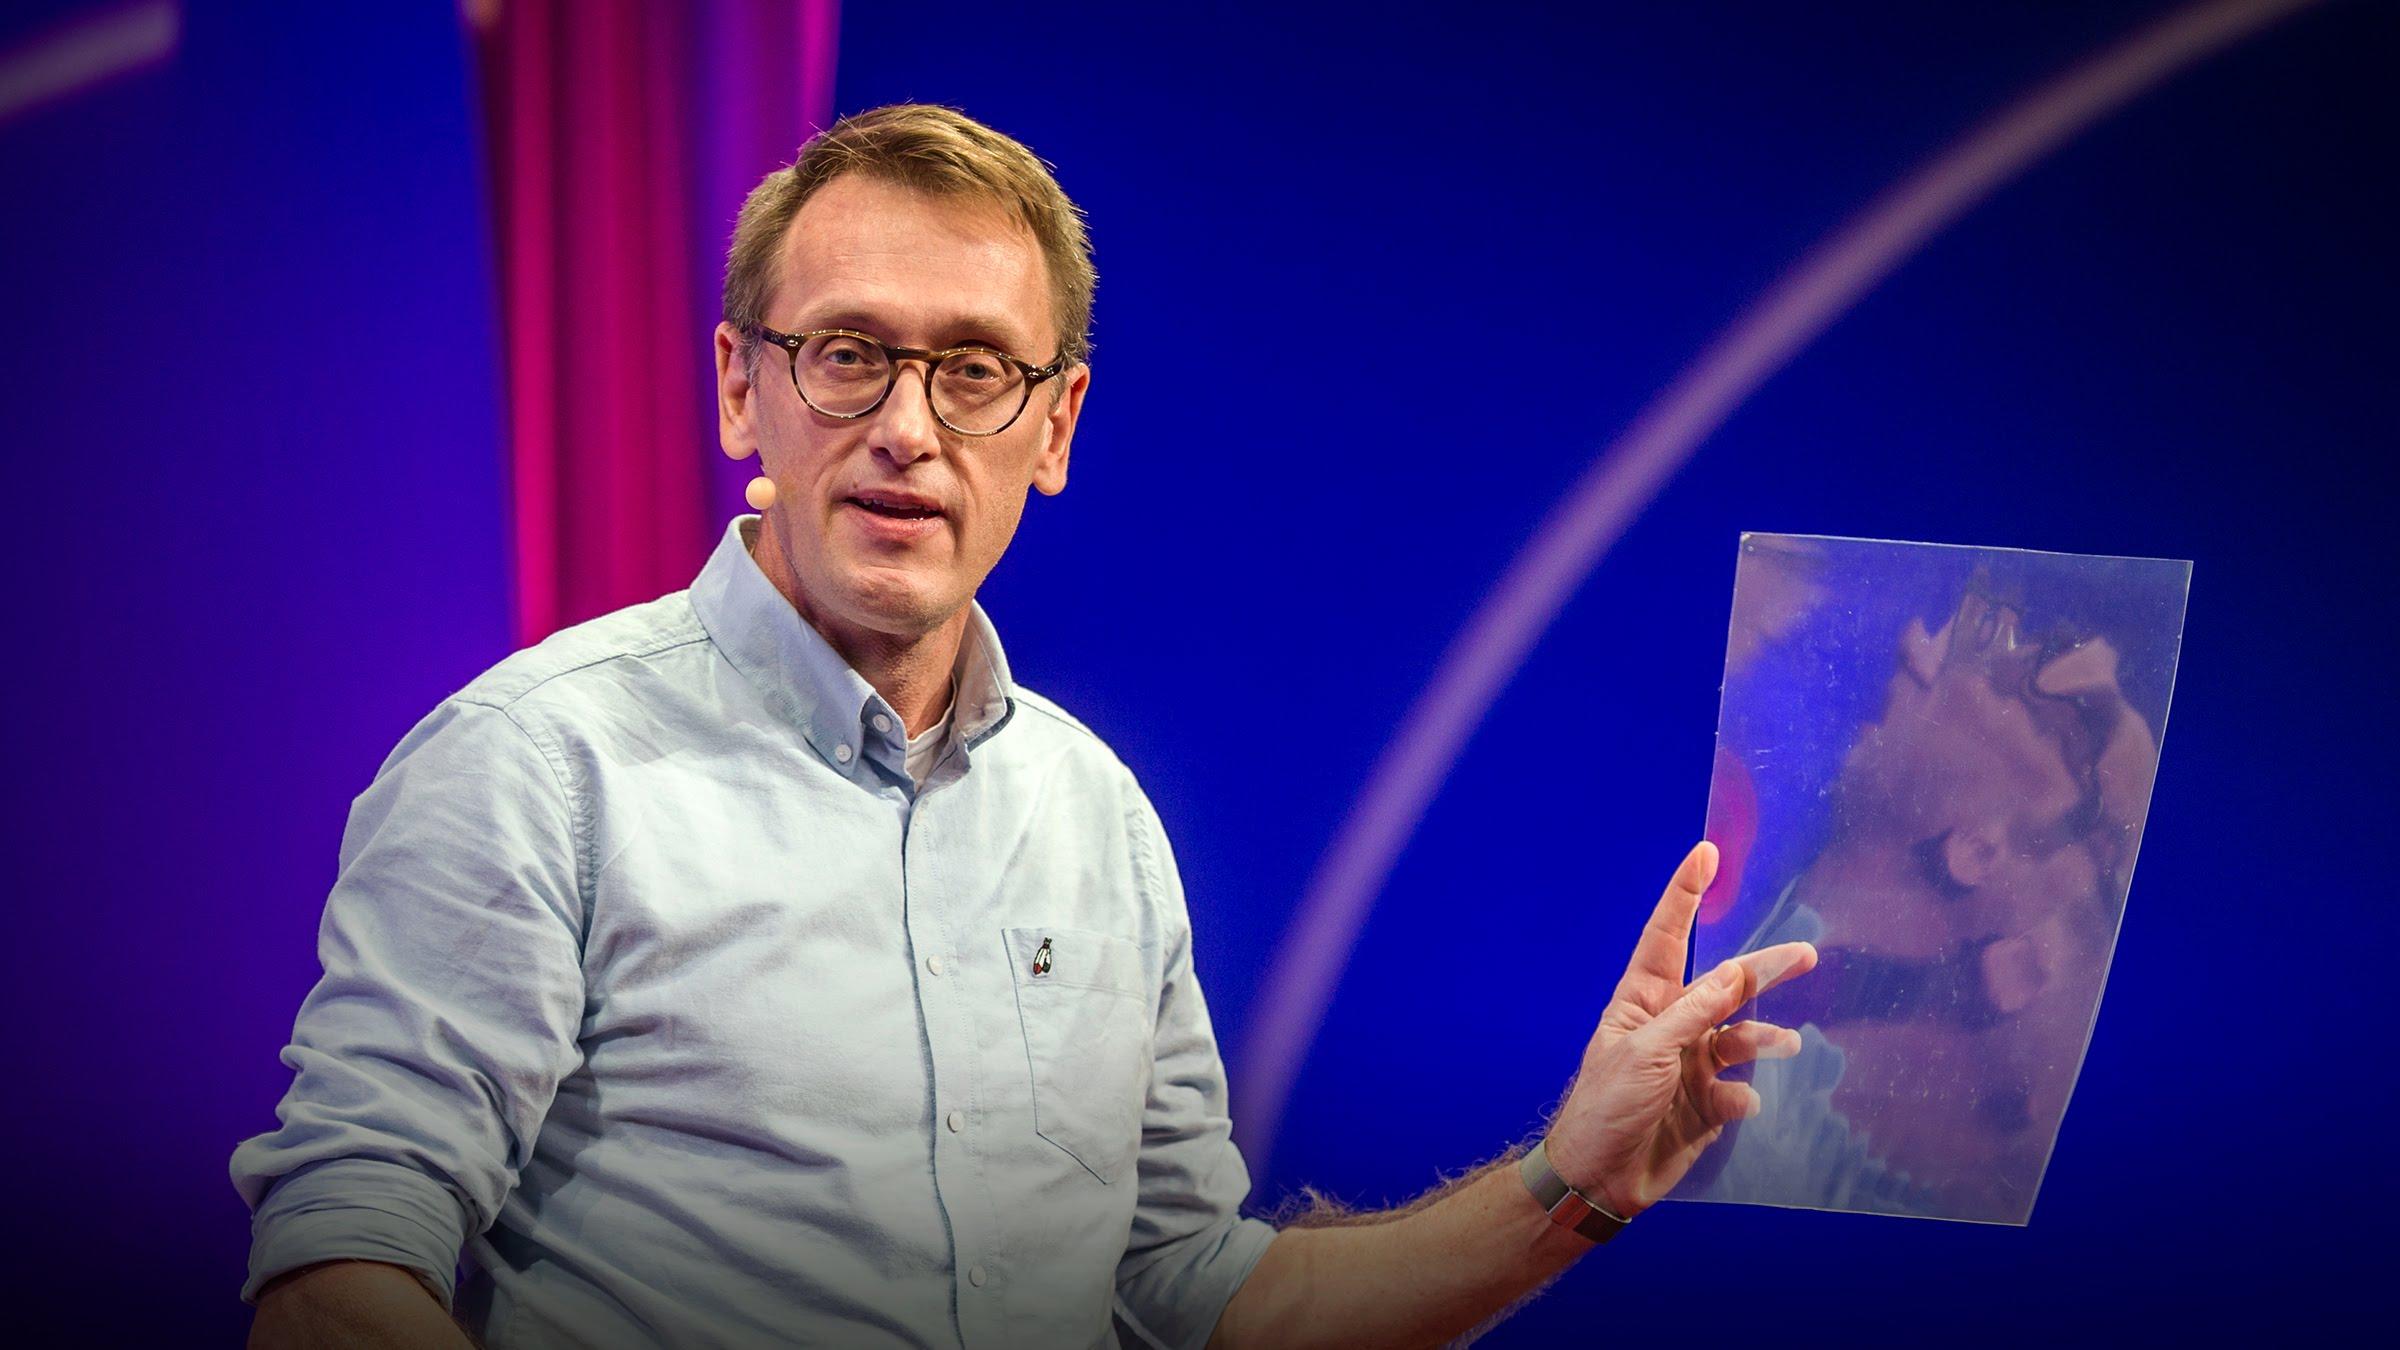 Mikael Fogelström